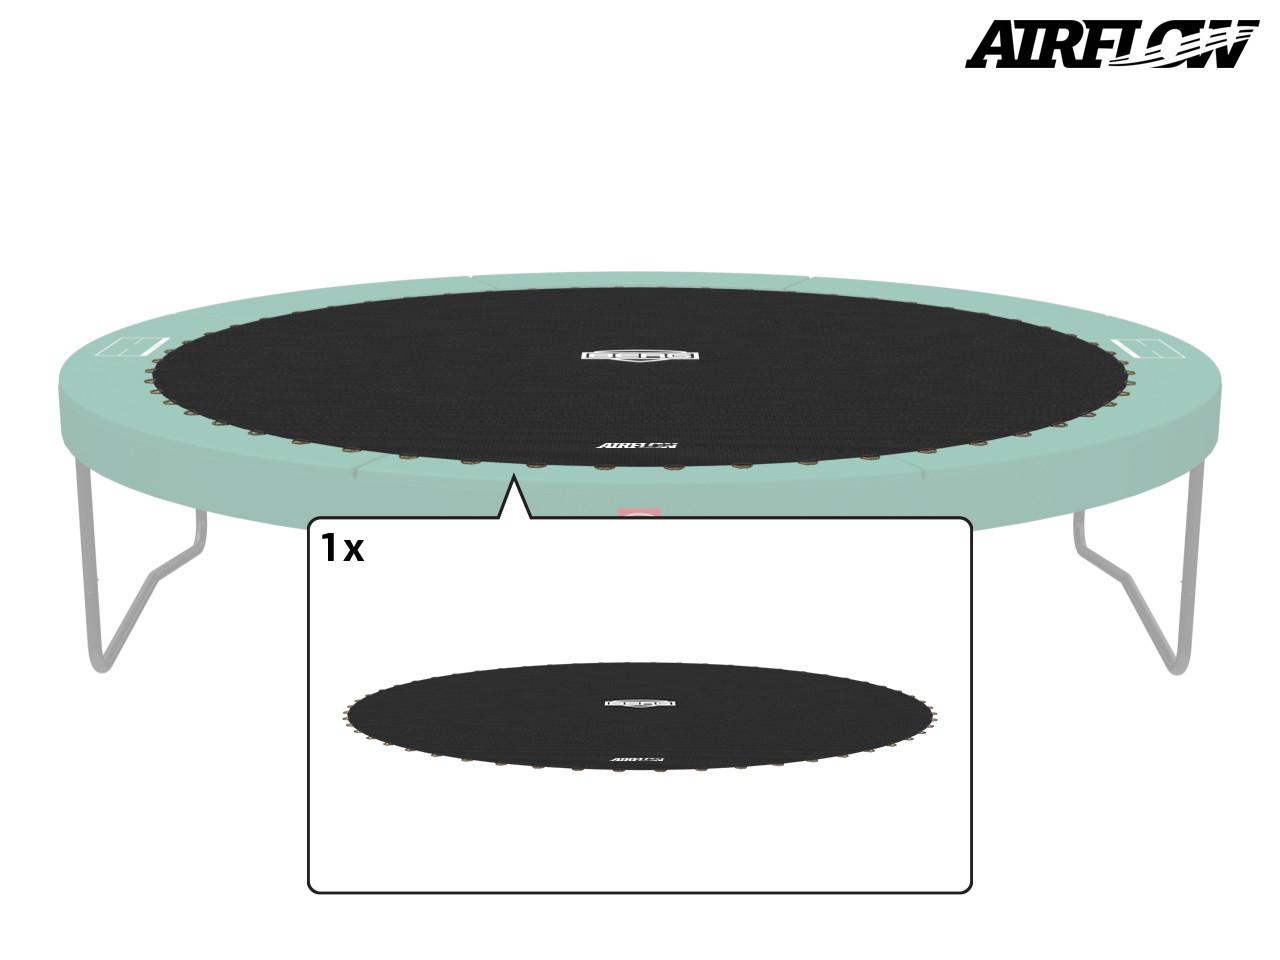 Champion - Jump mat 330 (11ft) (TwinSpring, AIRFLOW)